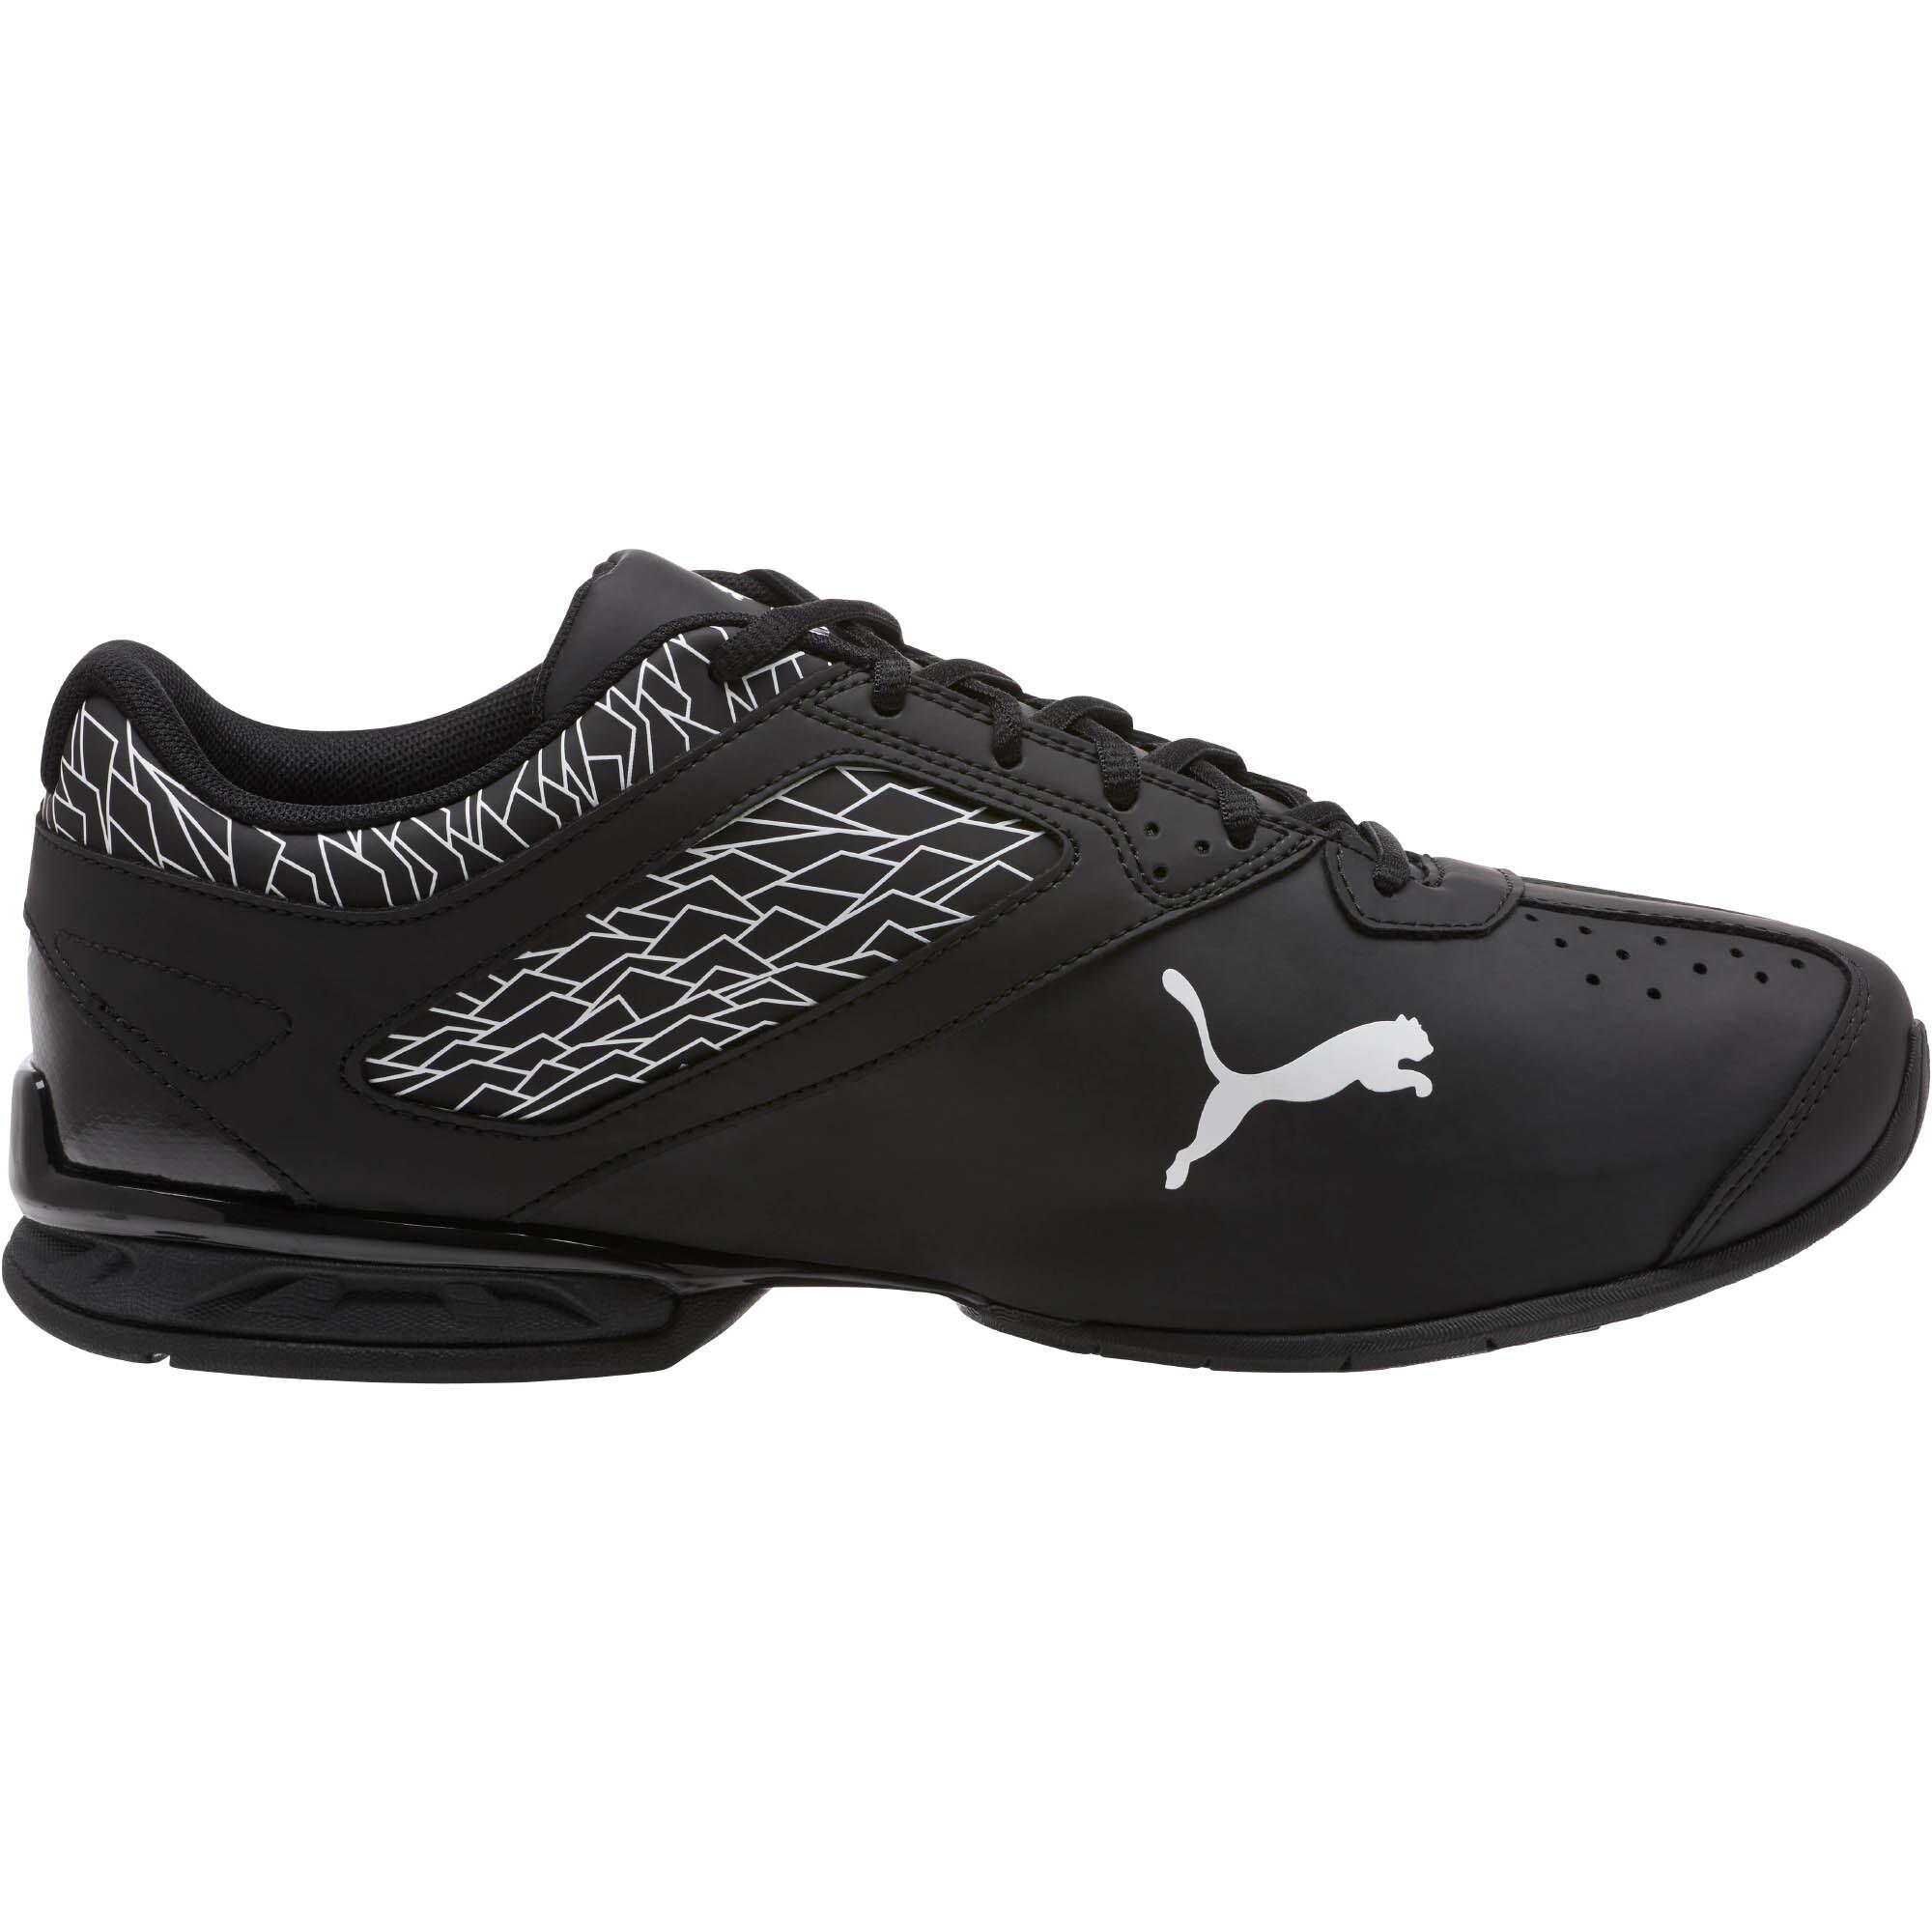 PUMA-Men-039-s-Tazon-6-Fracture-FM-Wide-Sneakers miniatura 5